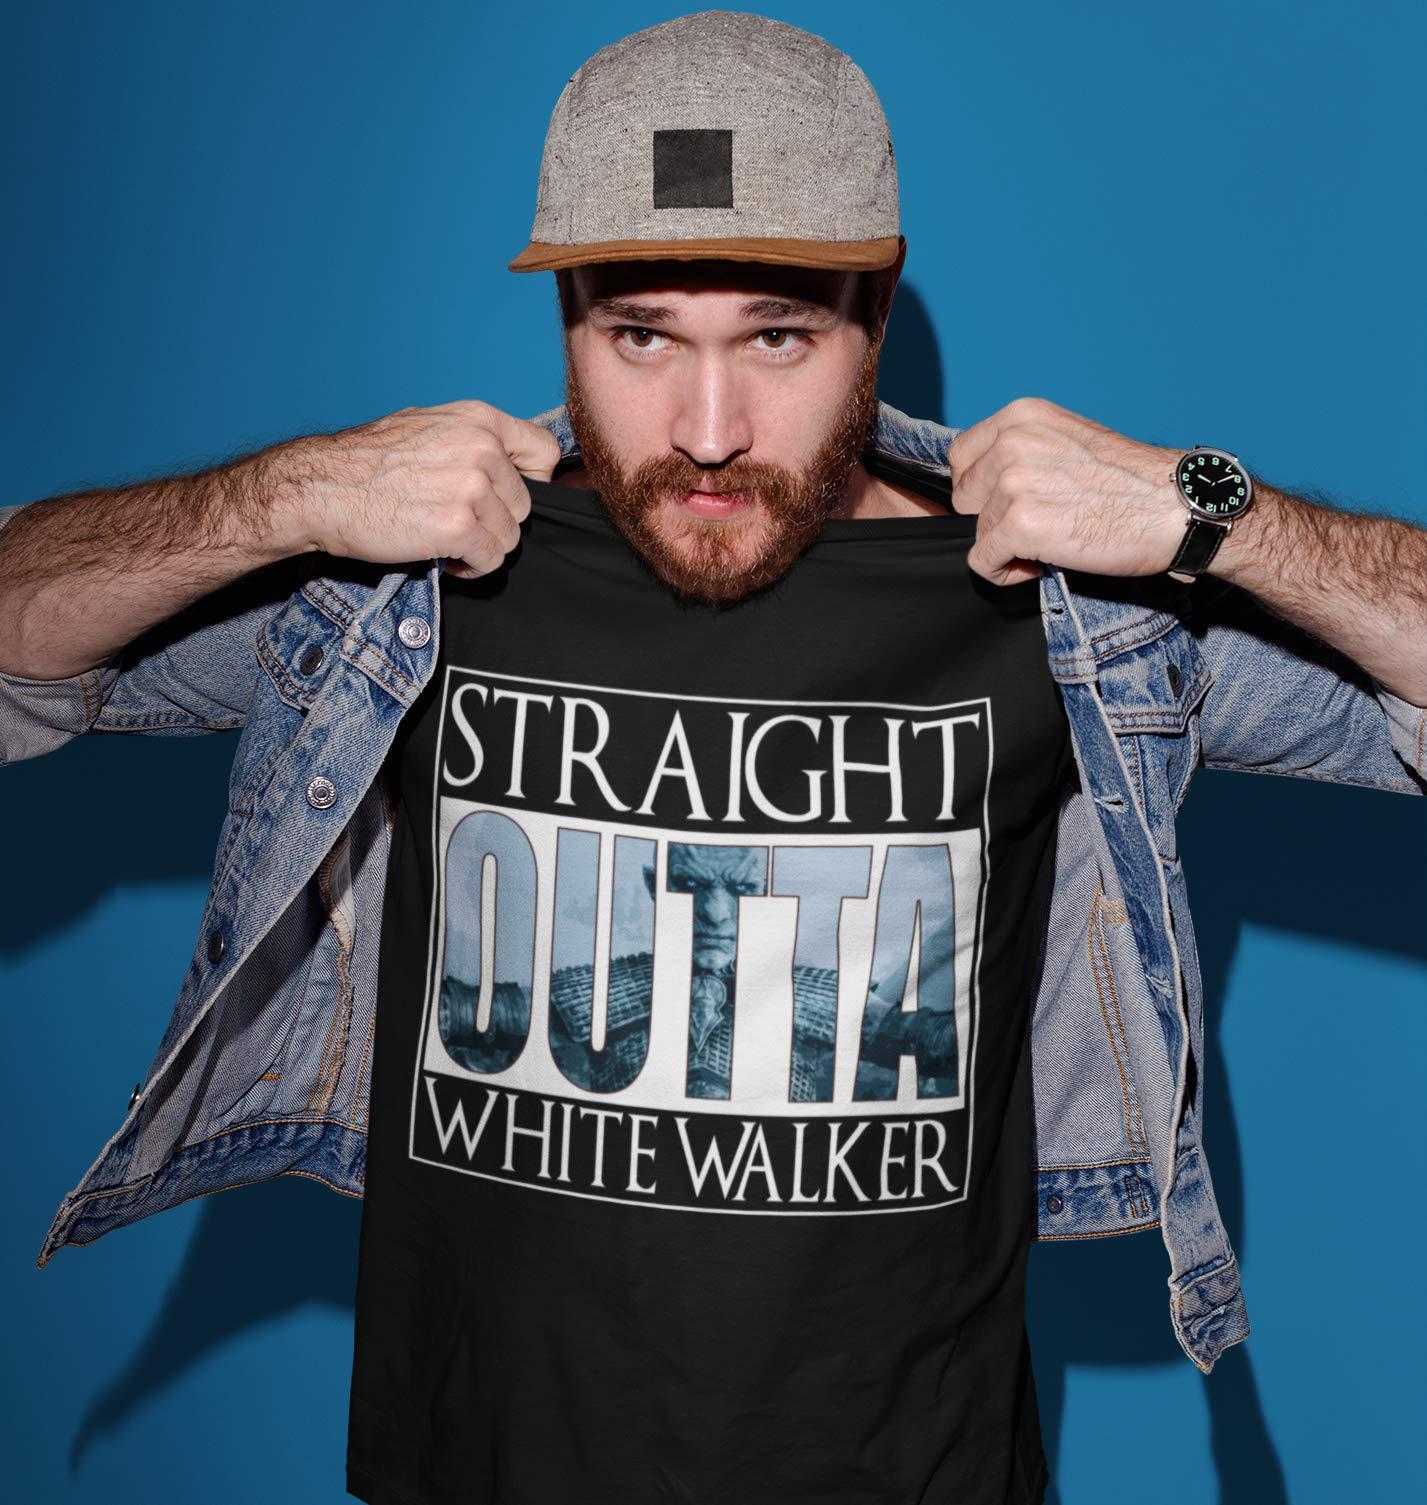 Straight Outta Walker Game Customized Handmade T Shirt Sweater Tank Top